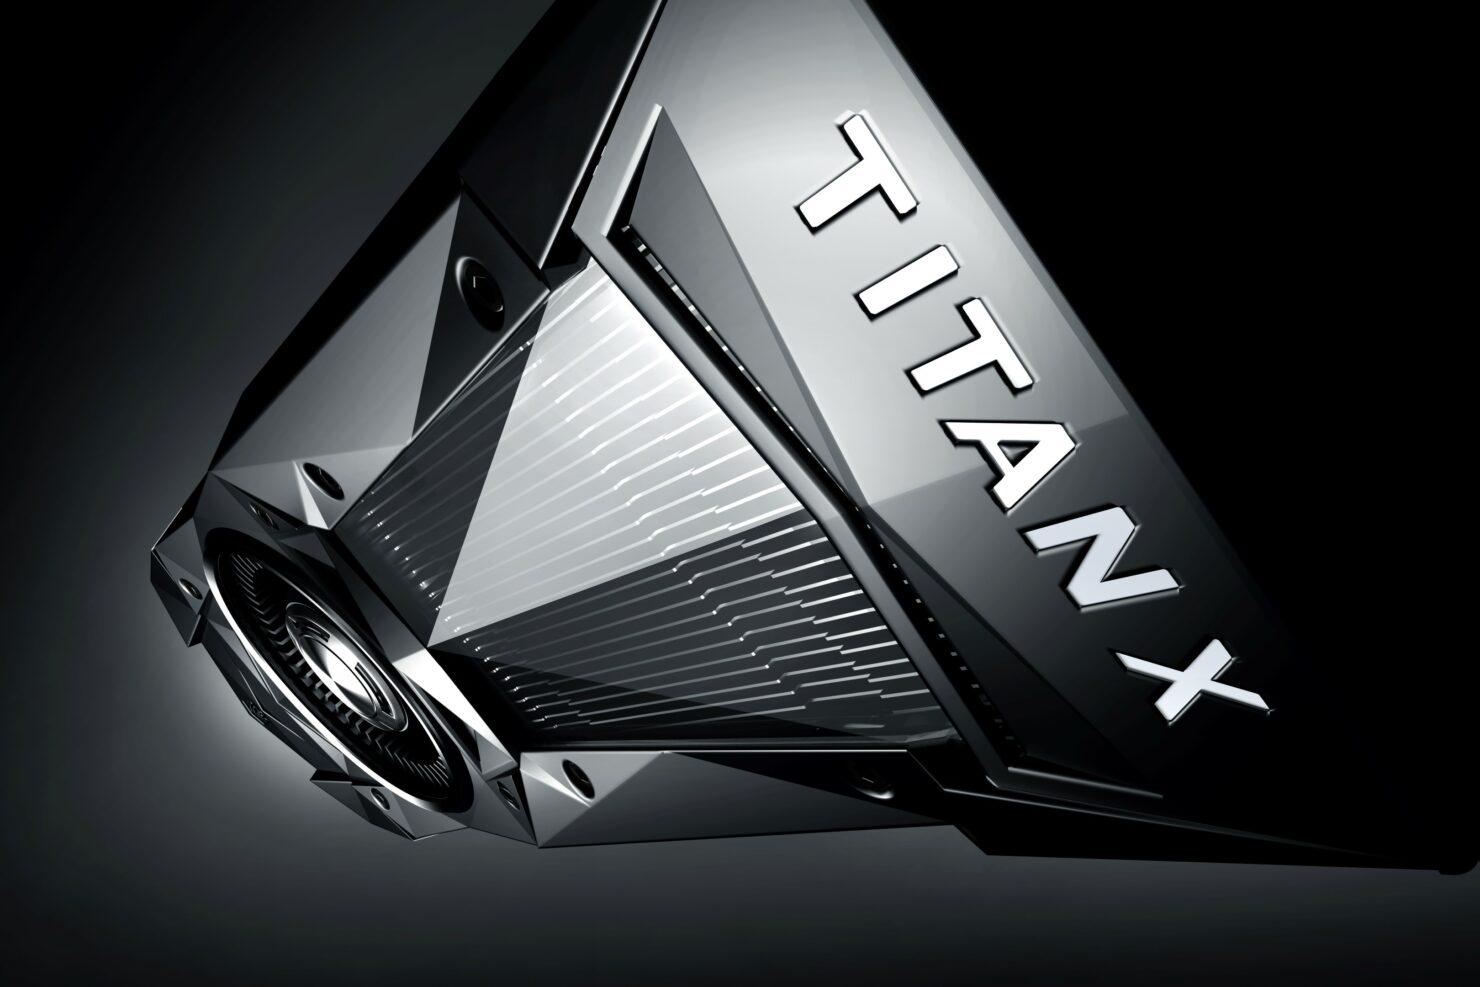 nvidia-titan-x-graphics-card_1-custom